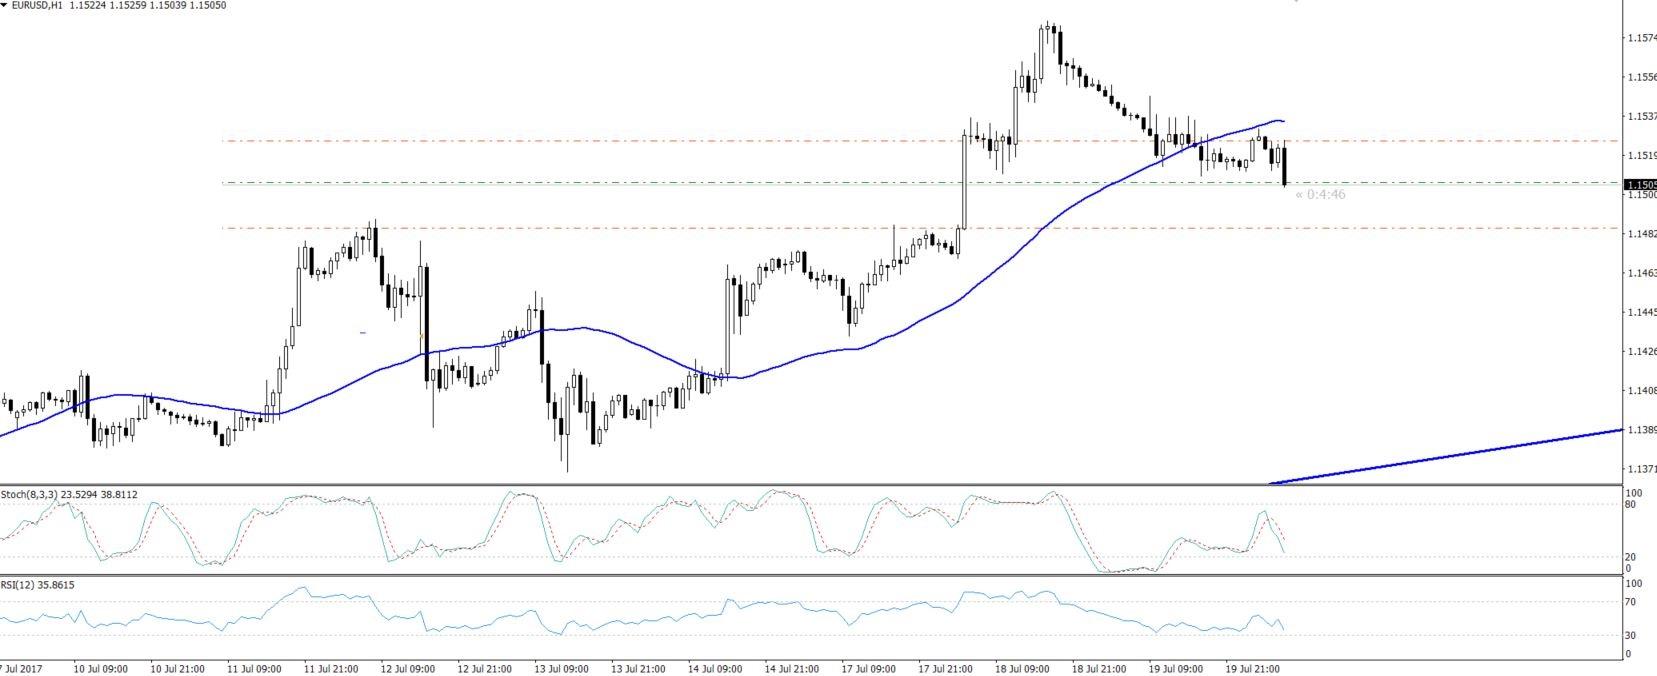 EURUSD - Hourly Chart - Bearish Crossover